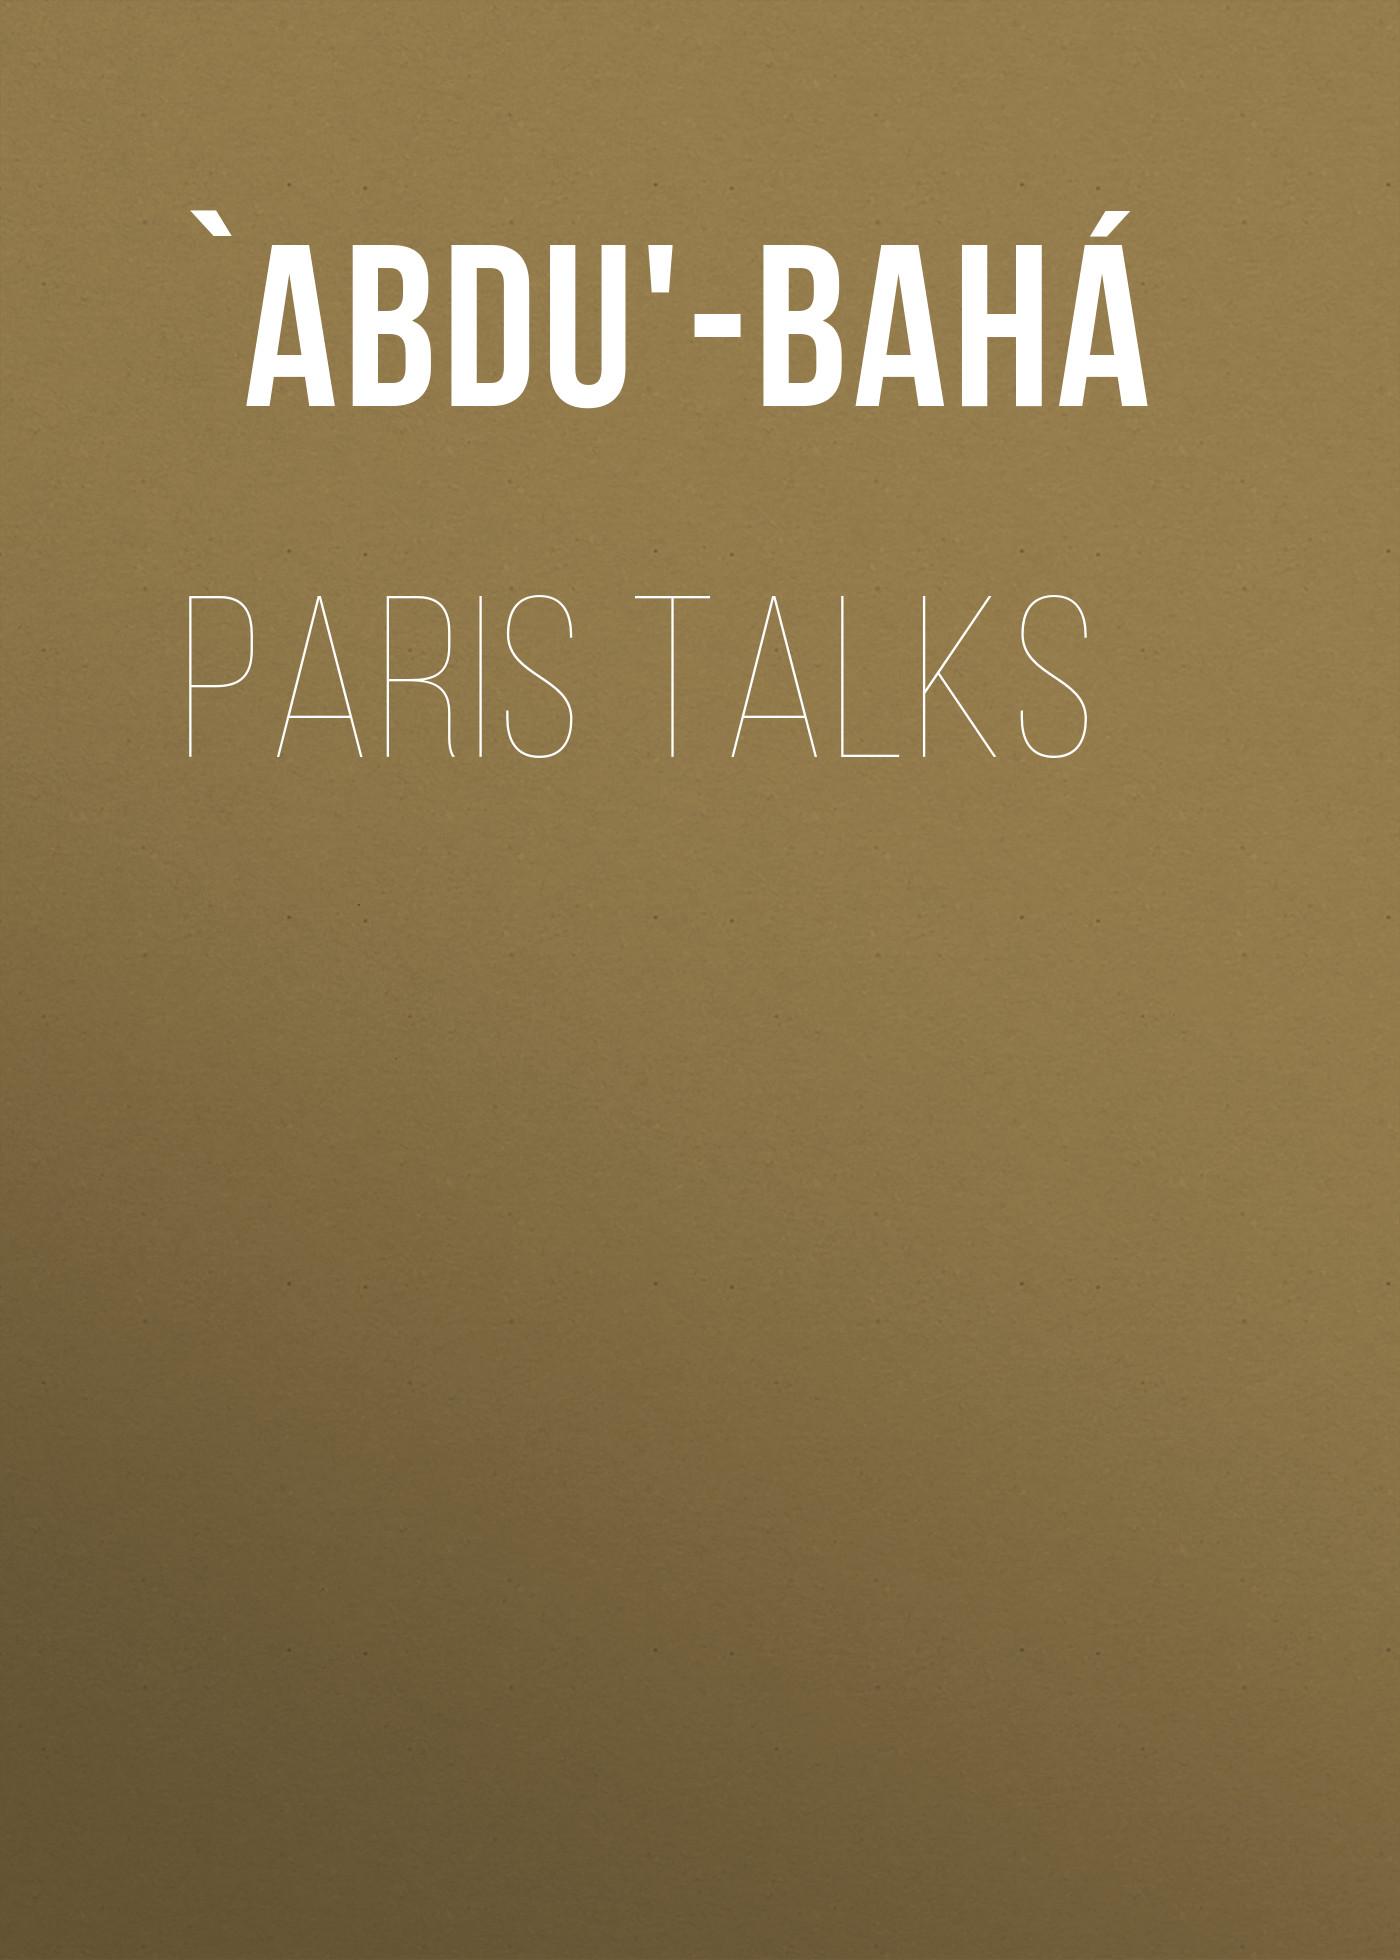 `Abdu'-Bahá Paris Talks catechetical talks